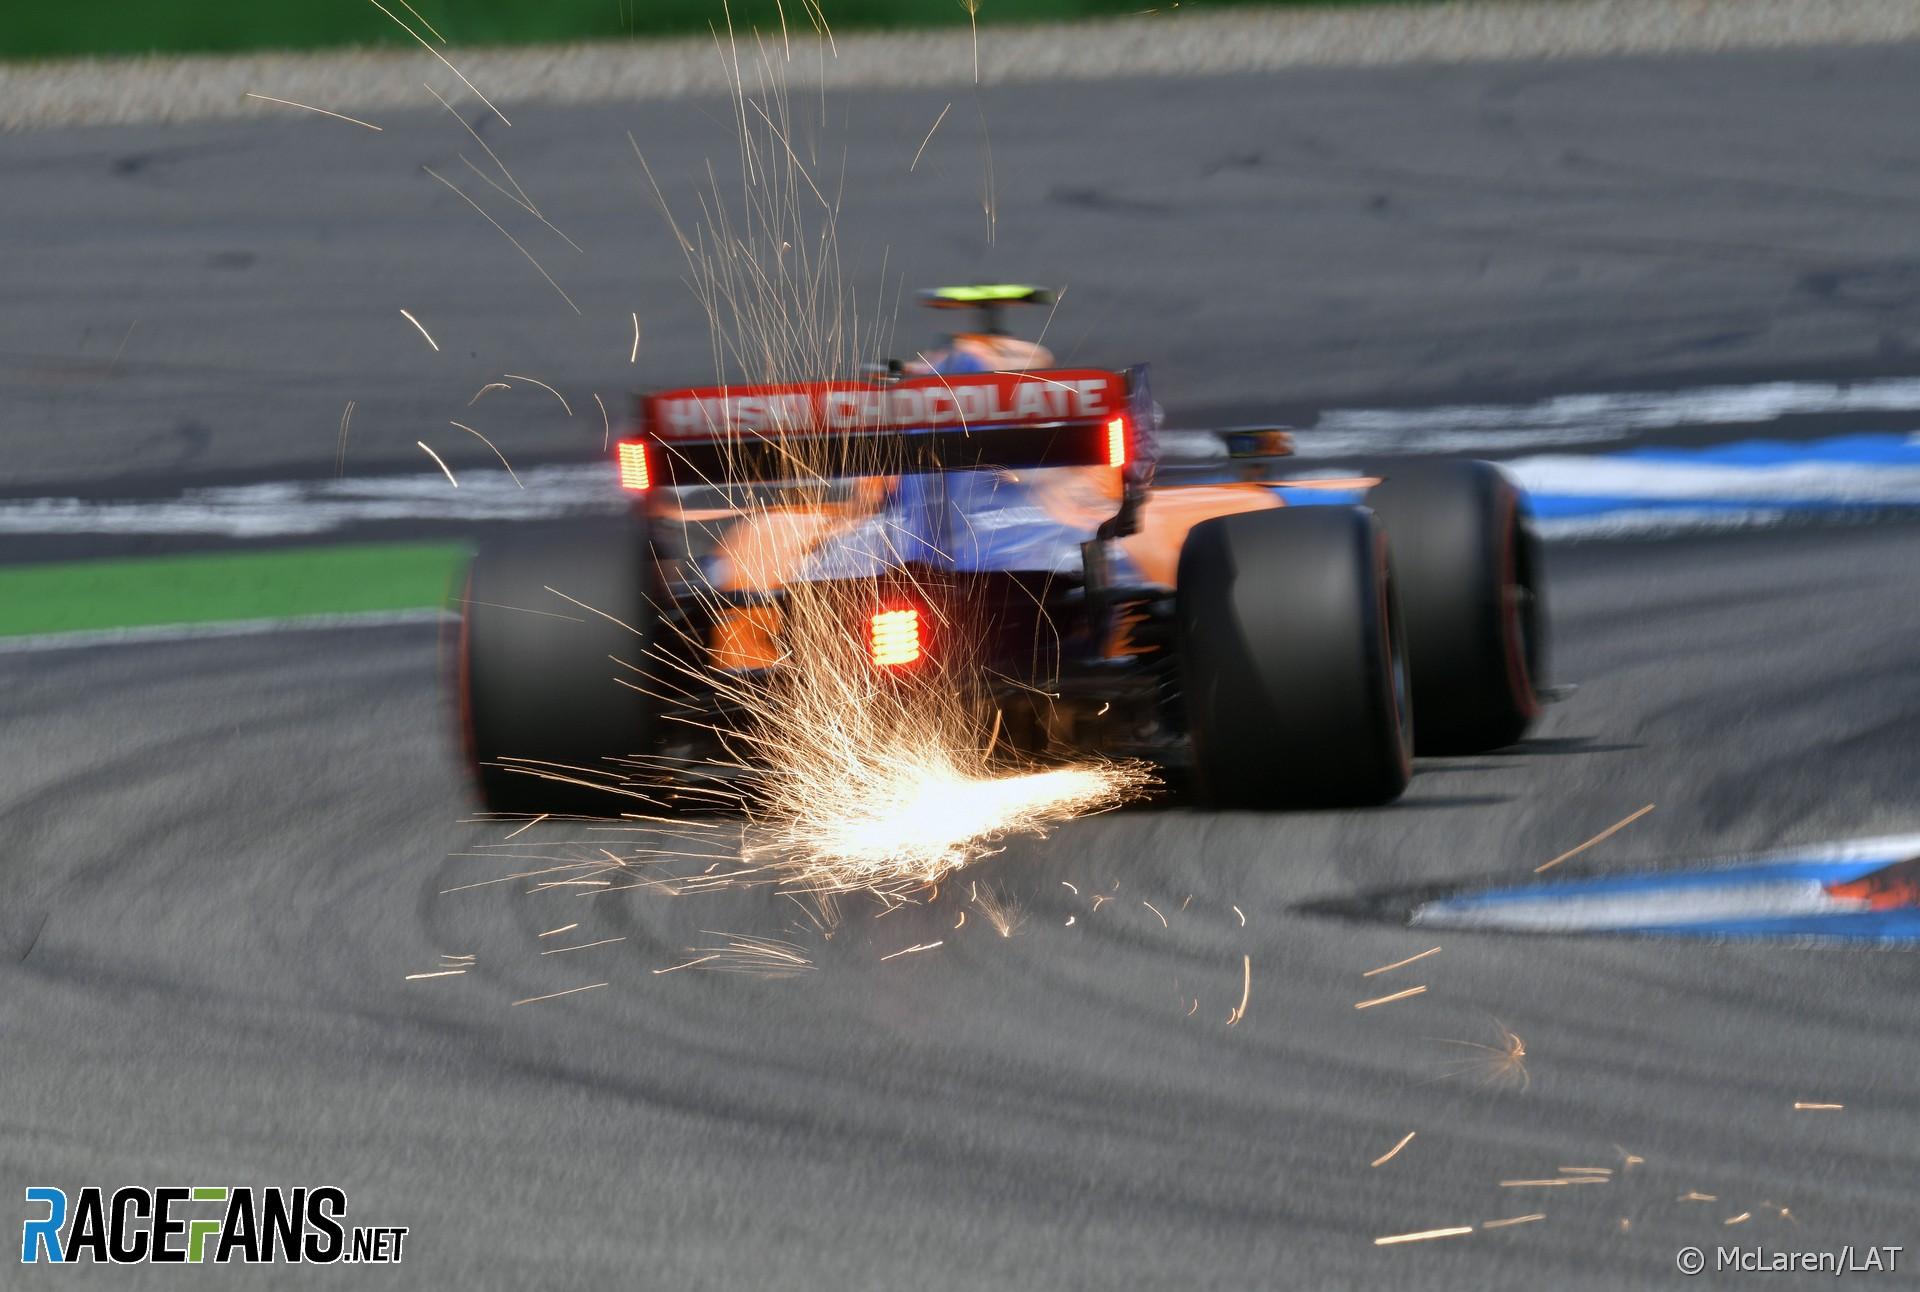 Lando Norris, McLaren, Hockenheimring, 2019